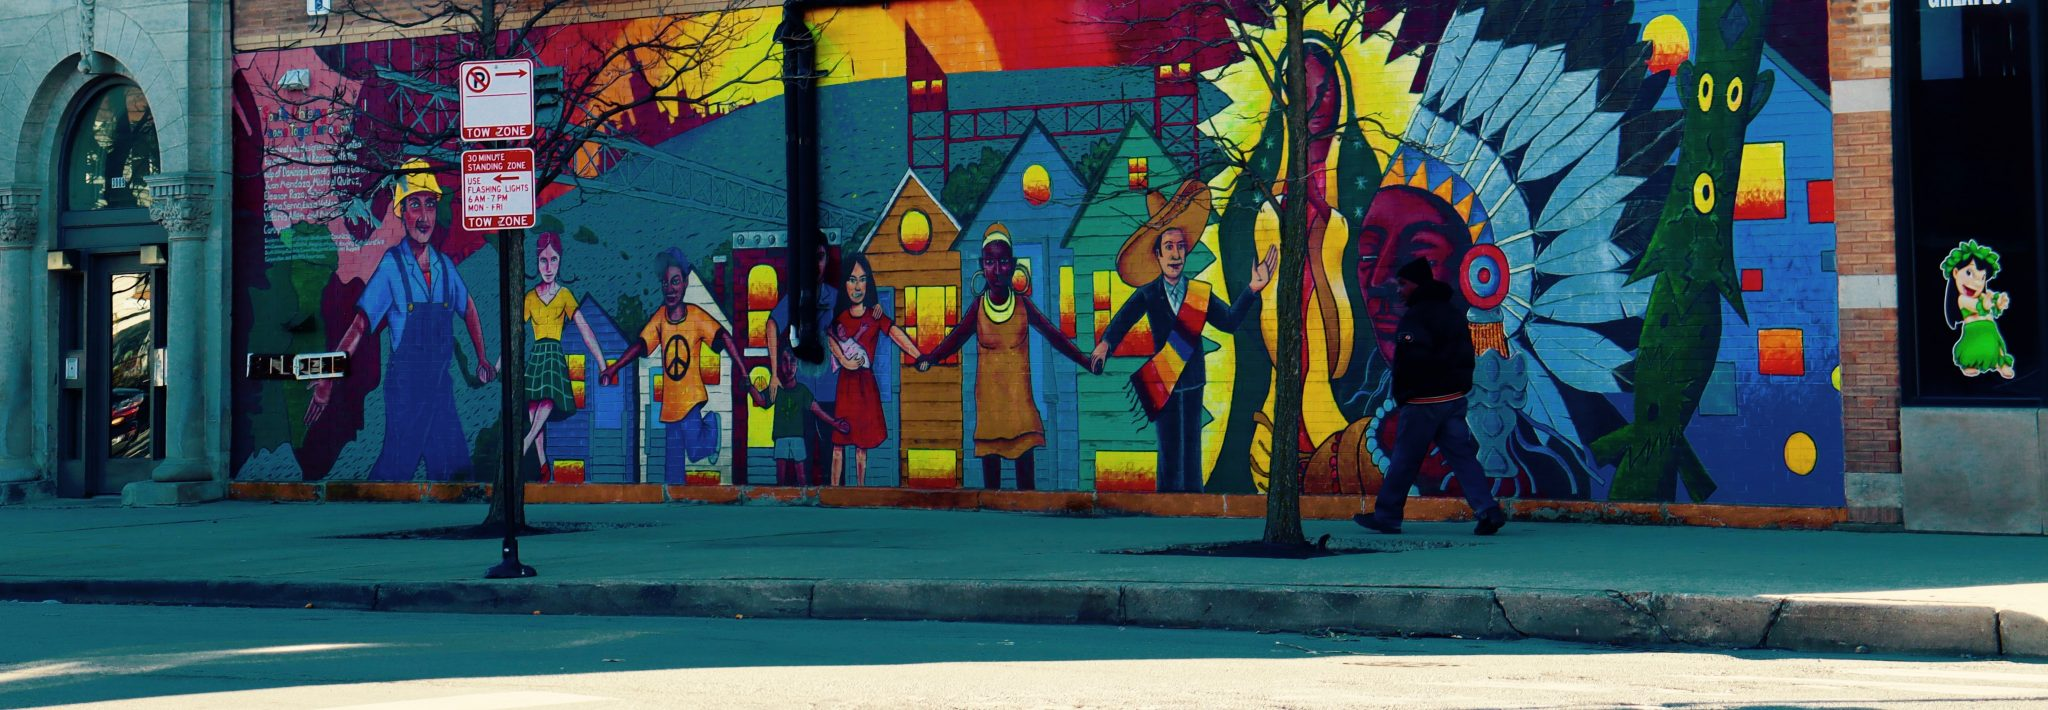 Native Street Art